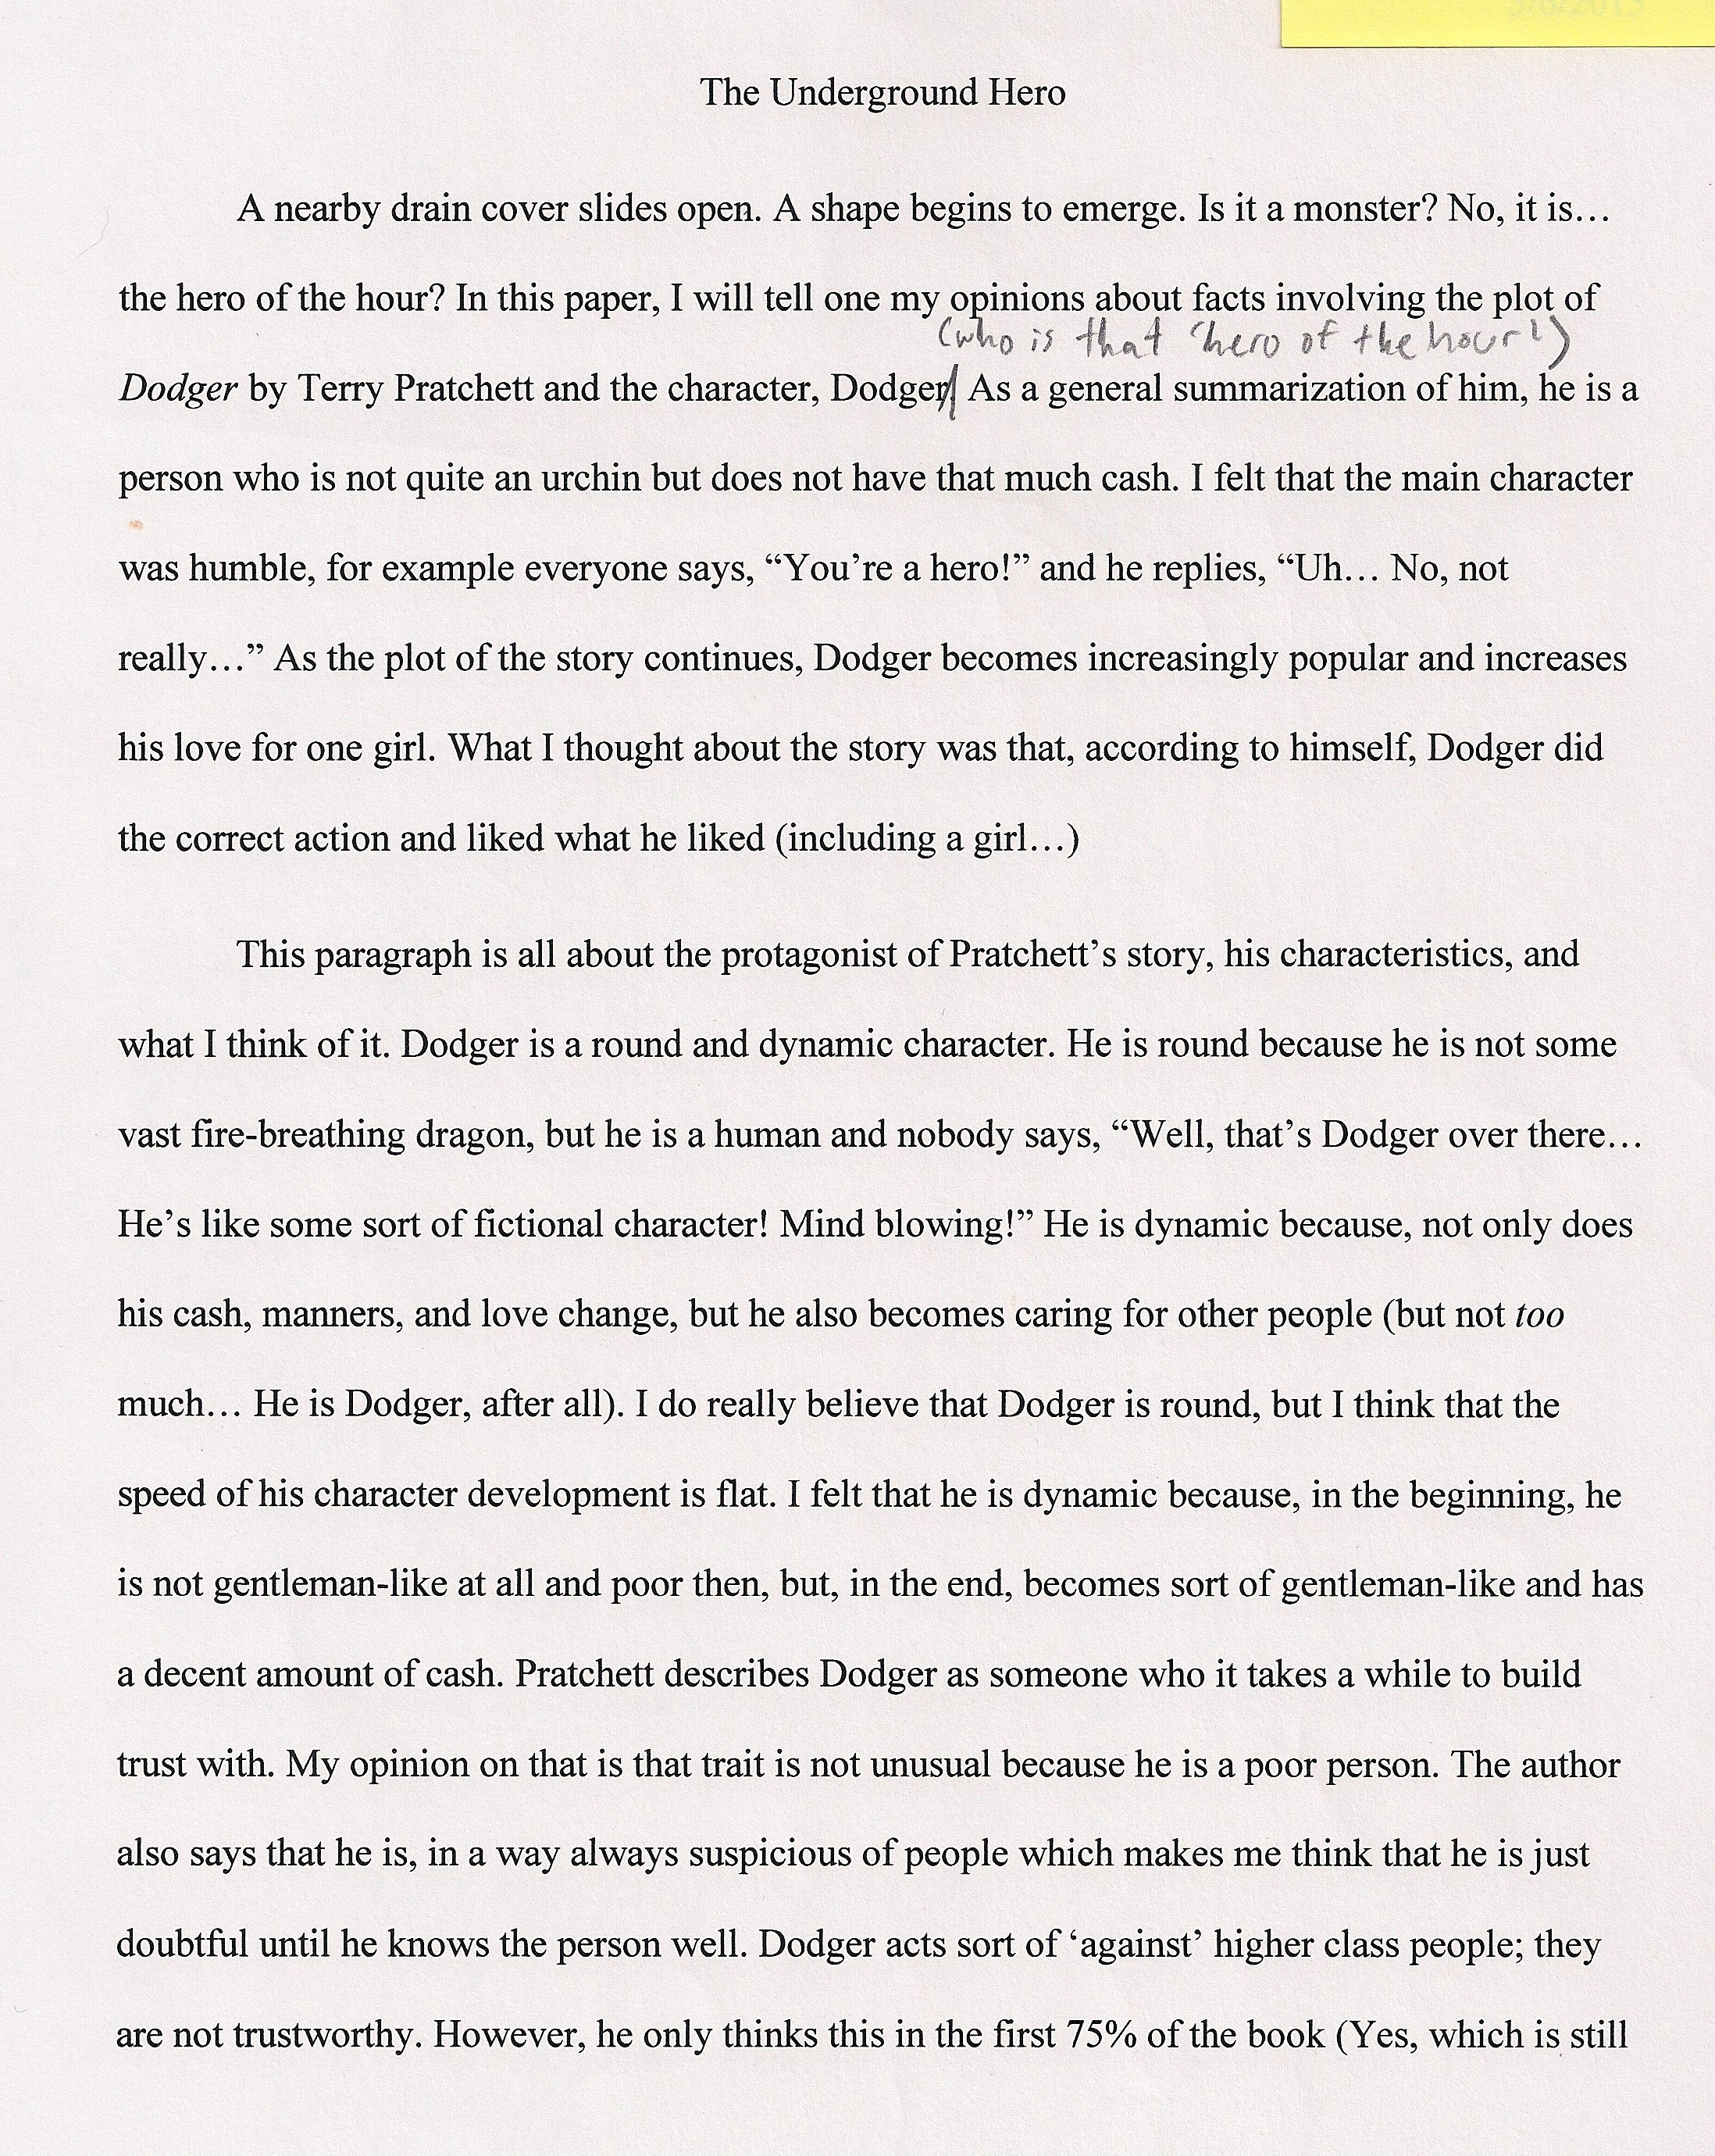 006 Unsung Heroes Essay Example The Underground Hero Fantastic Of India Intro My Mom Full